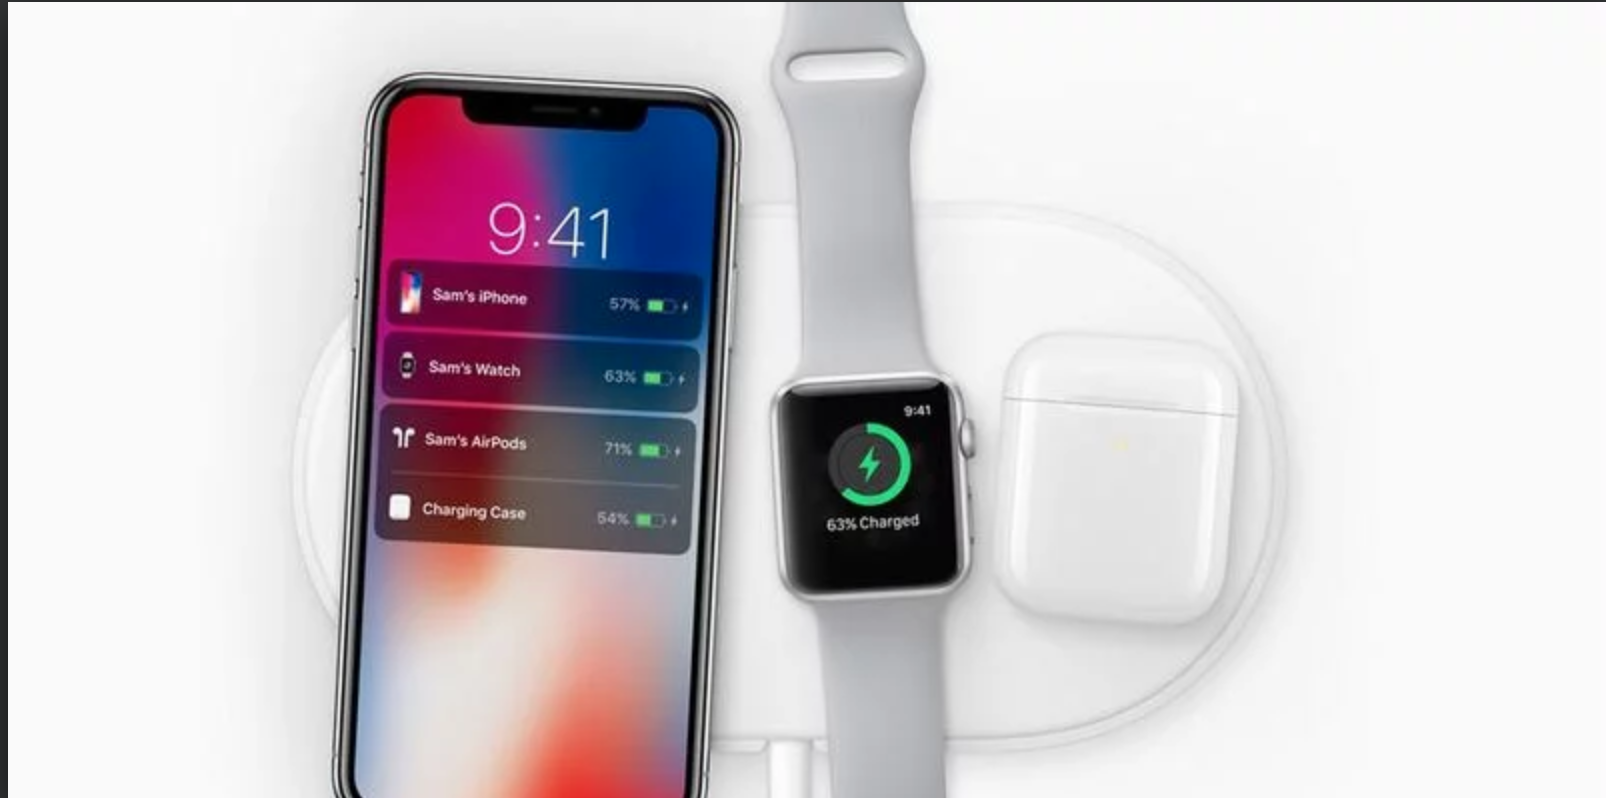 zdroj. Apple.com